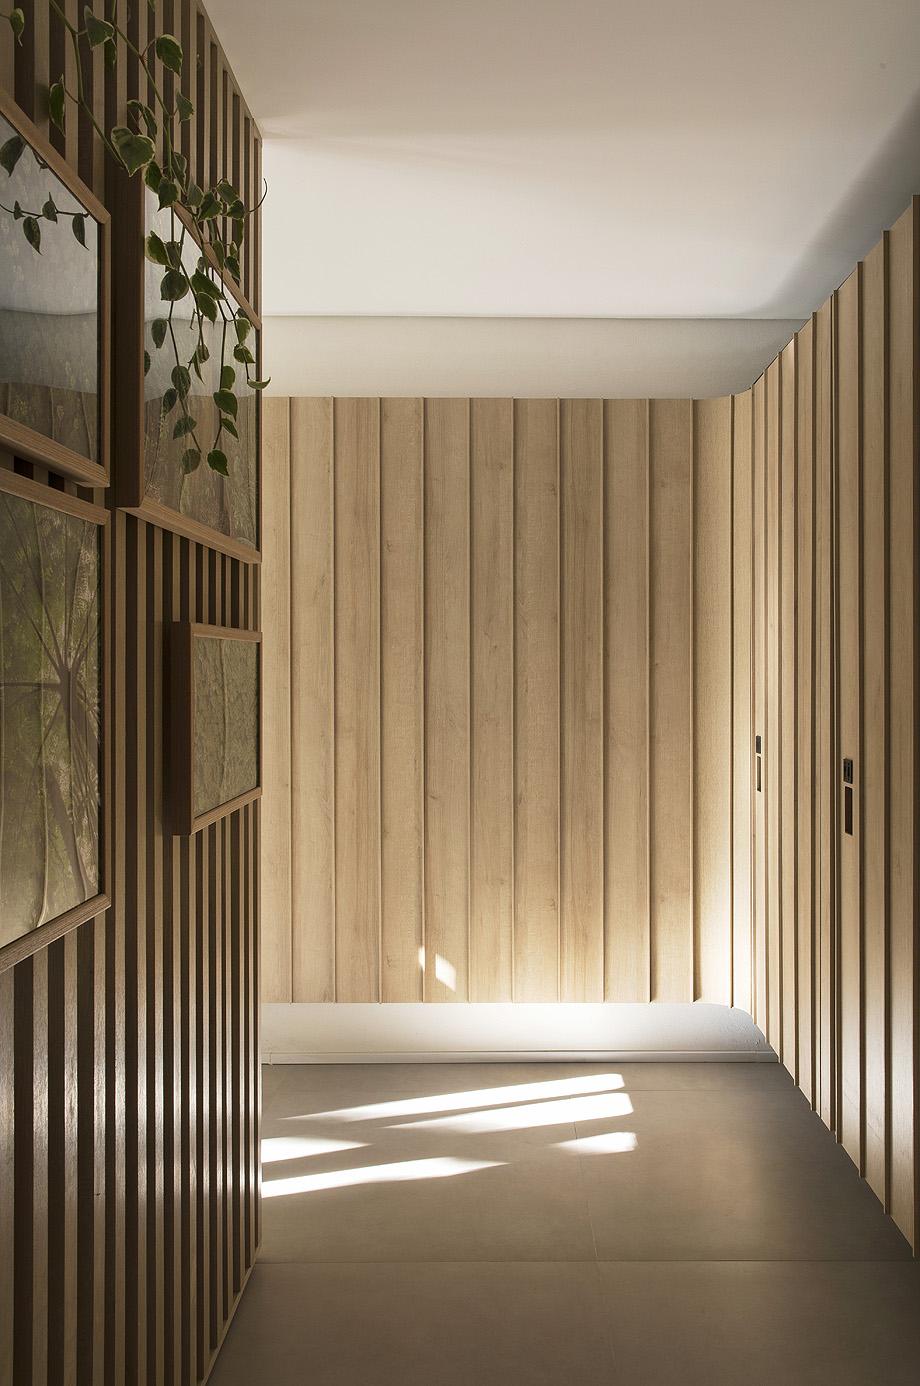 recinto do bosque de gdl arquitectura - foto felipe araujo (11)